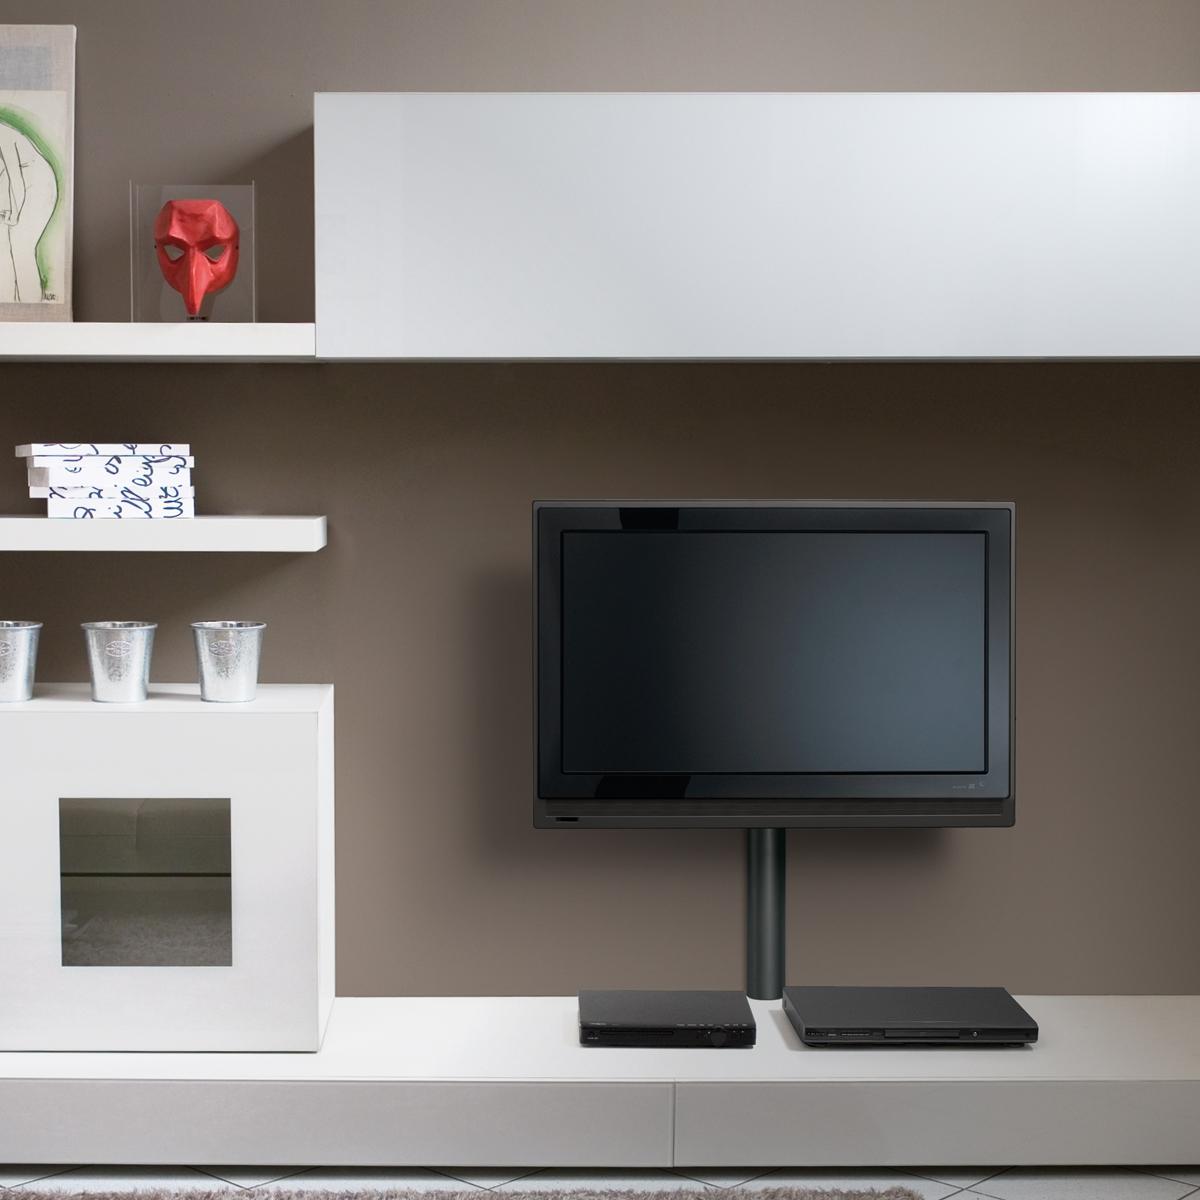 meliconi cable cover 65 maxi noir support mural tv meliconi sur. Black Bedroom Furniture Sets. Home Design Ideas